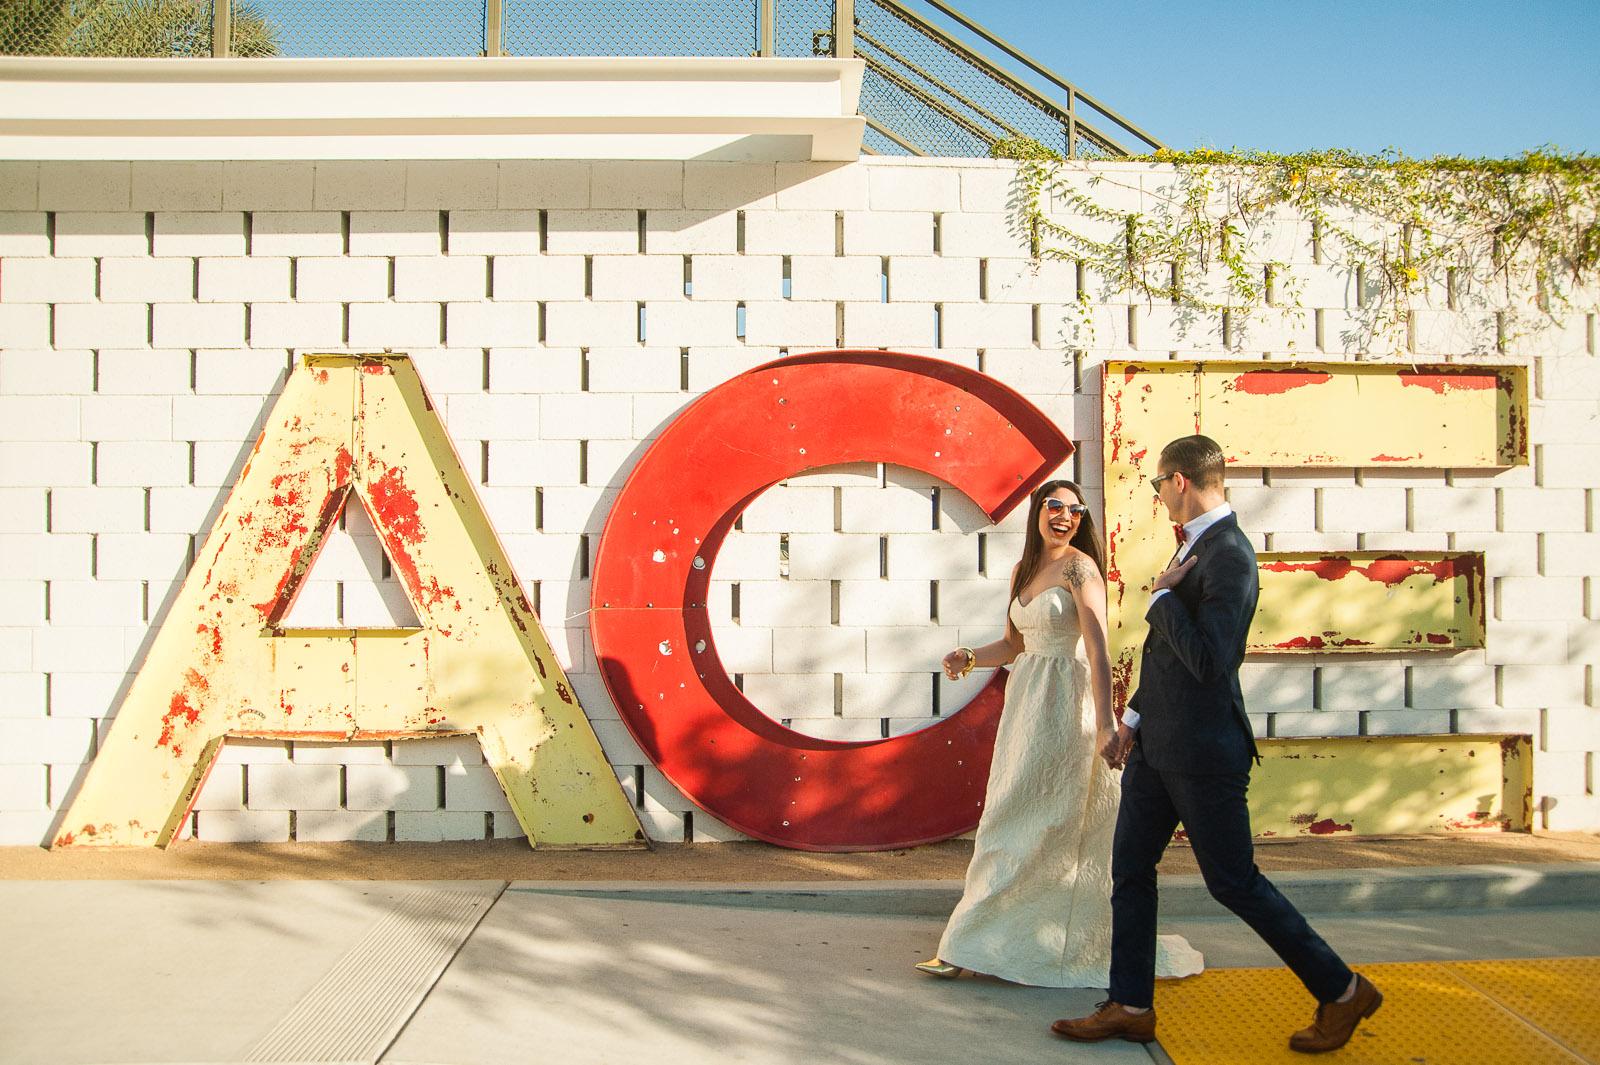 ace-hotel-palm-springs-wedding-28.jpg